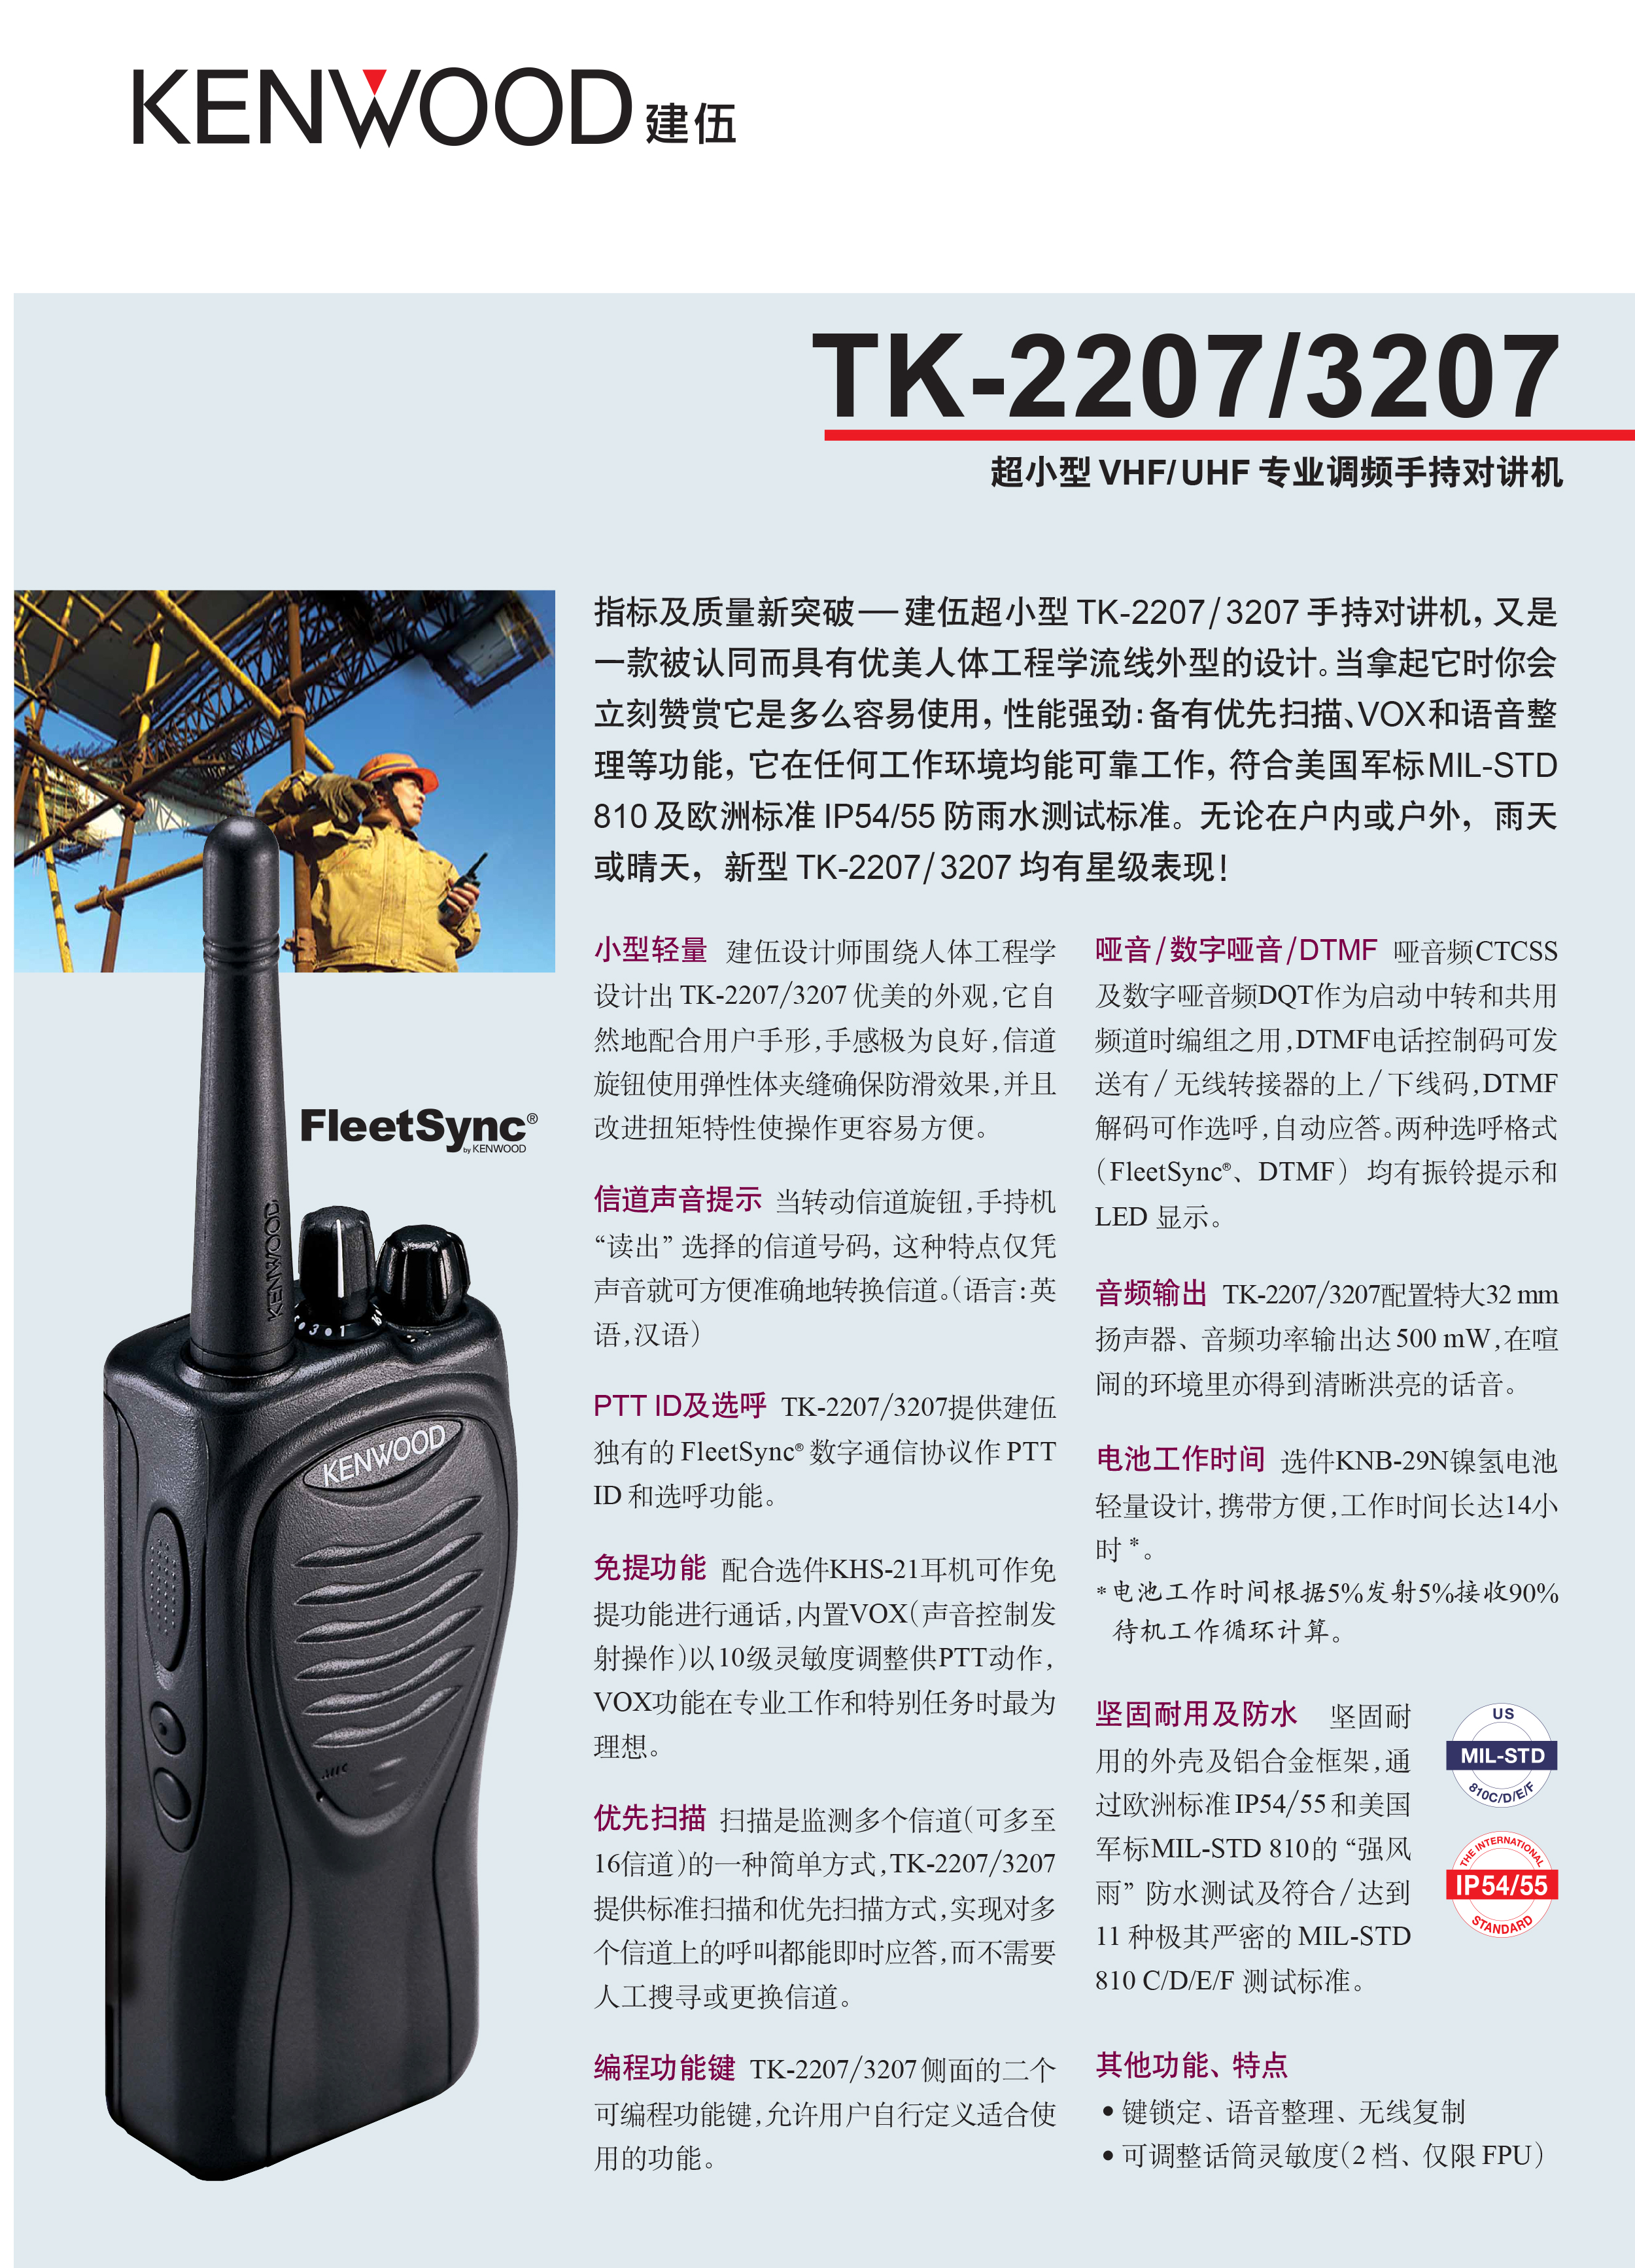 TK2207-3207模拟对讲机彩页_01